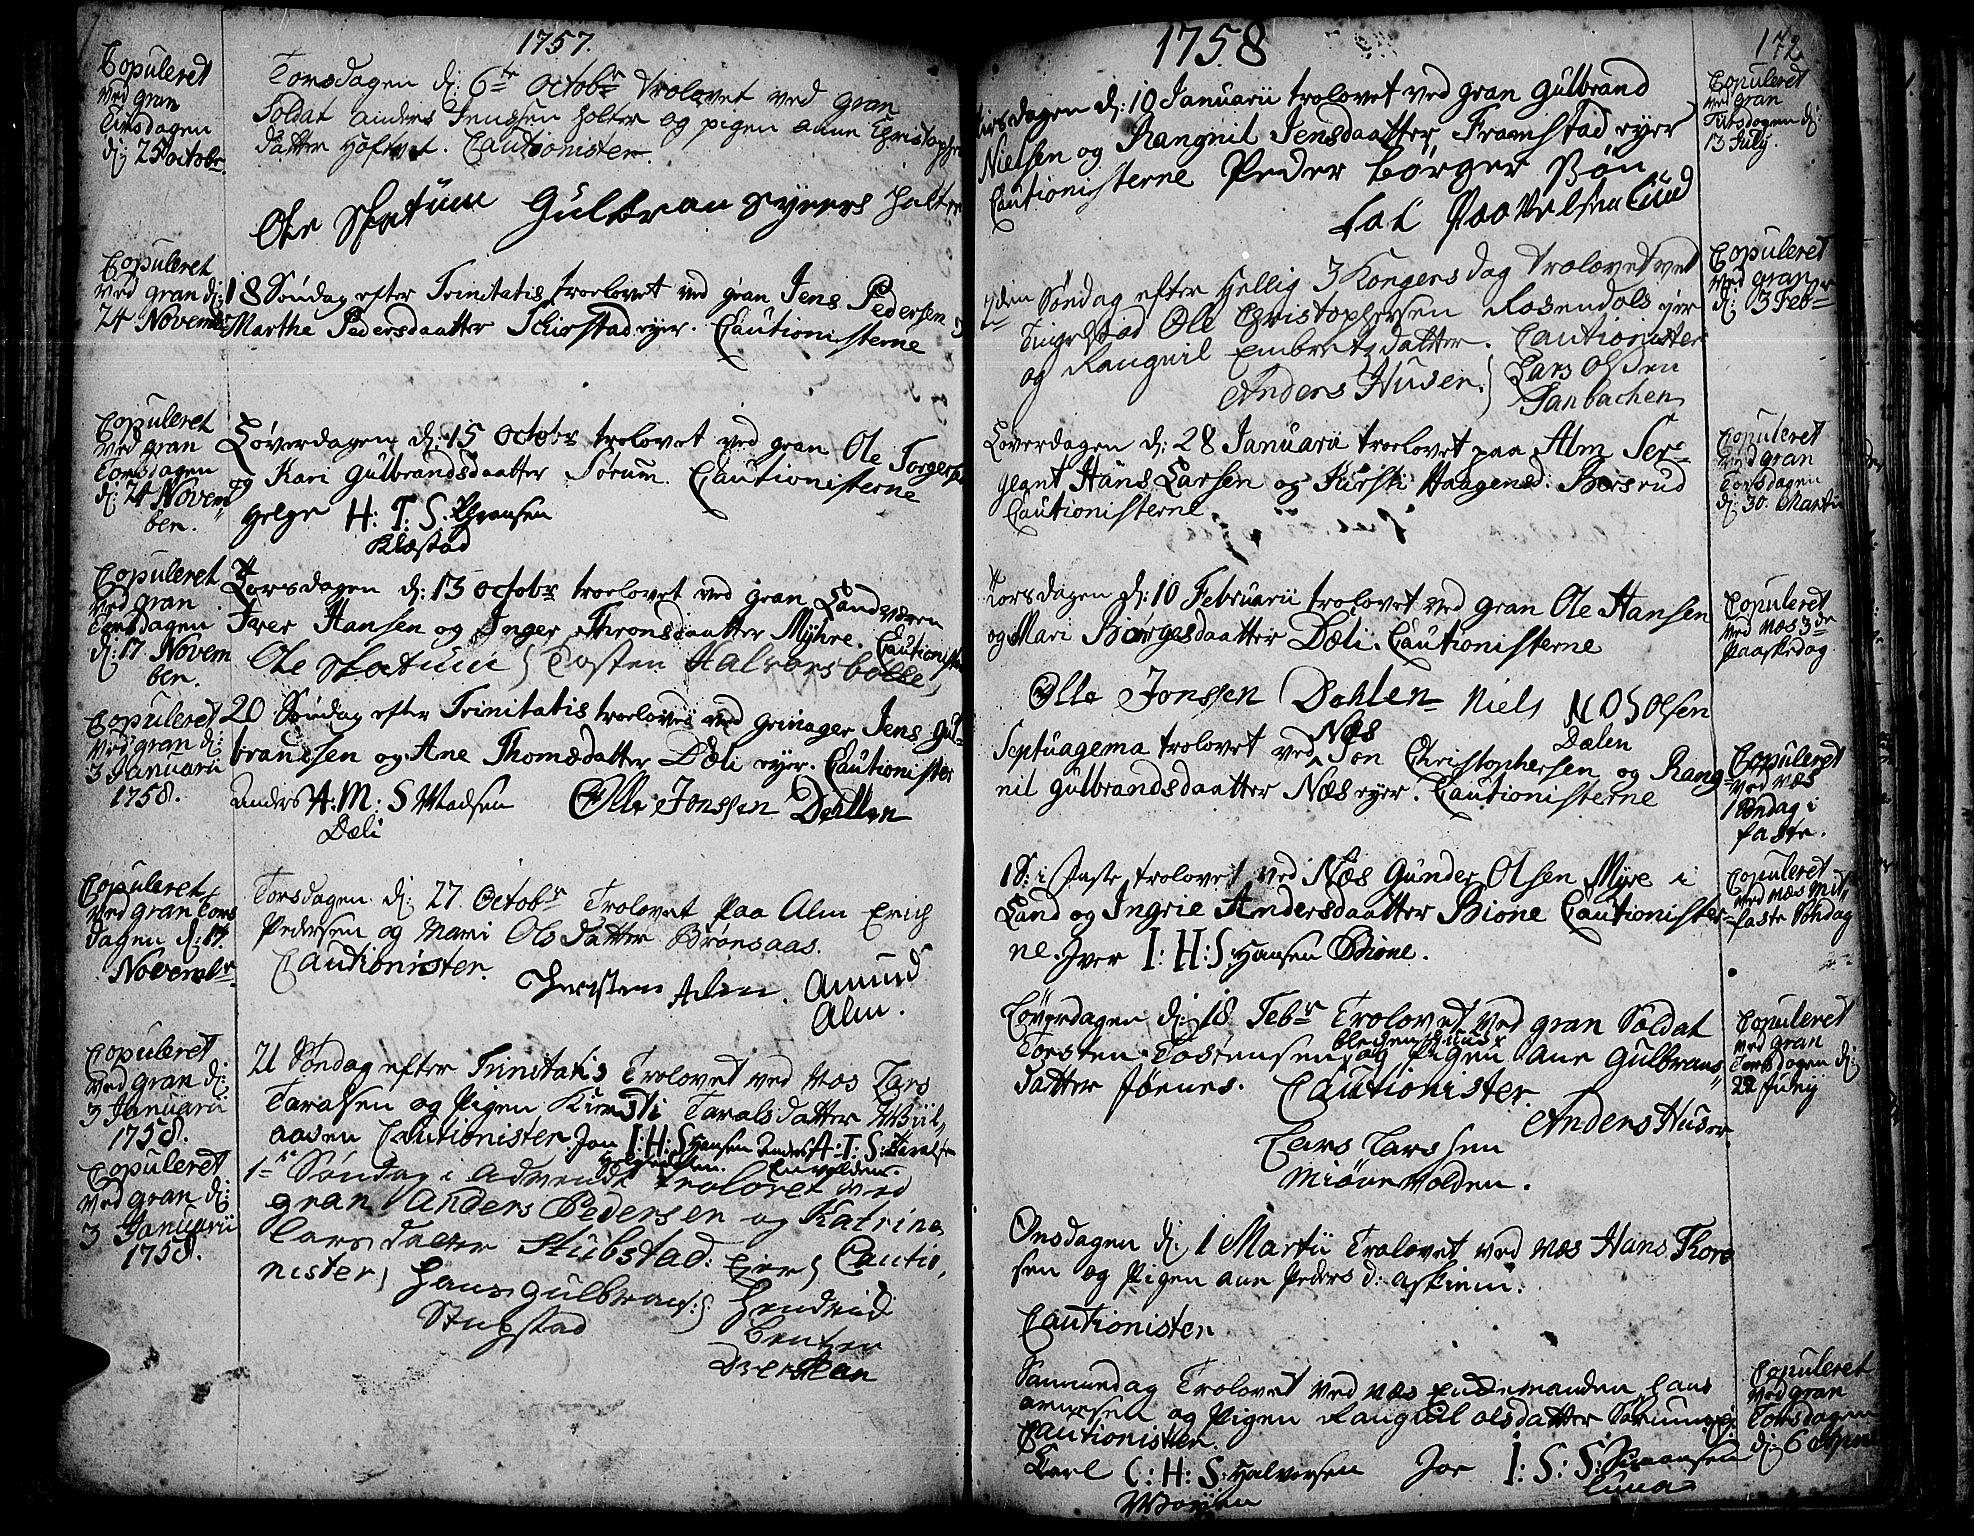 SAH, Gran prestekontor, Ministerialbok nr. 3, 1745-1758, s. 172